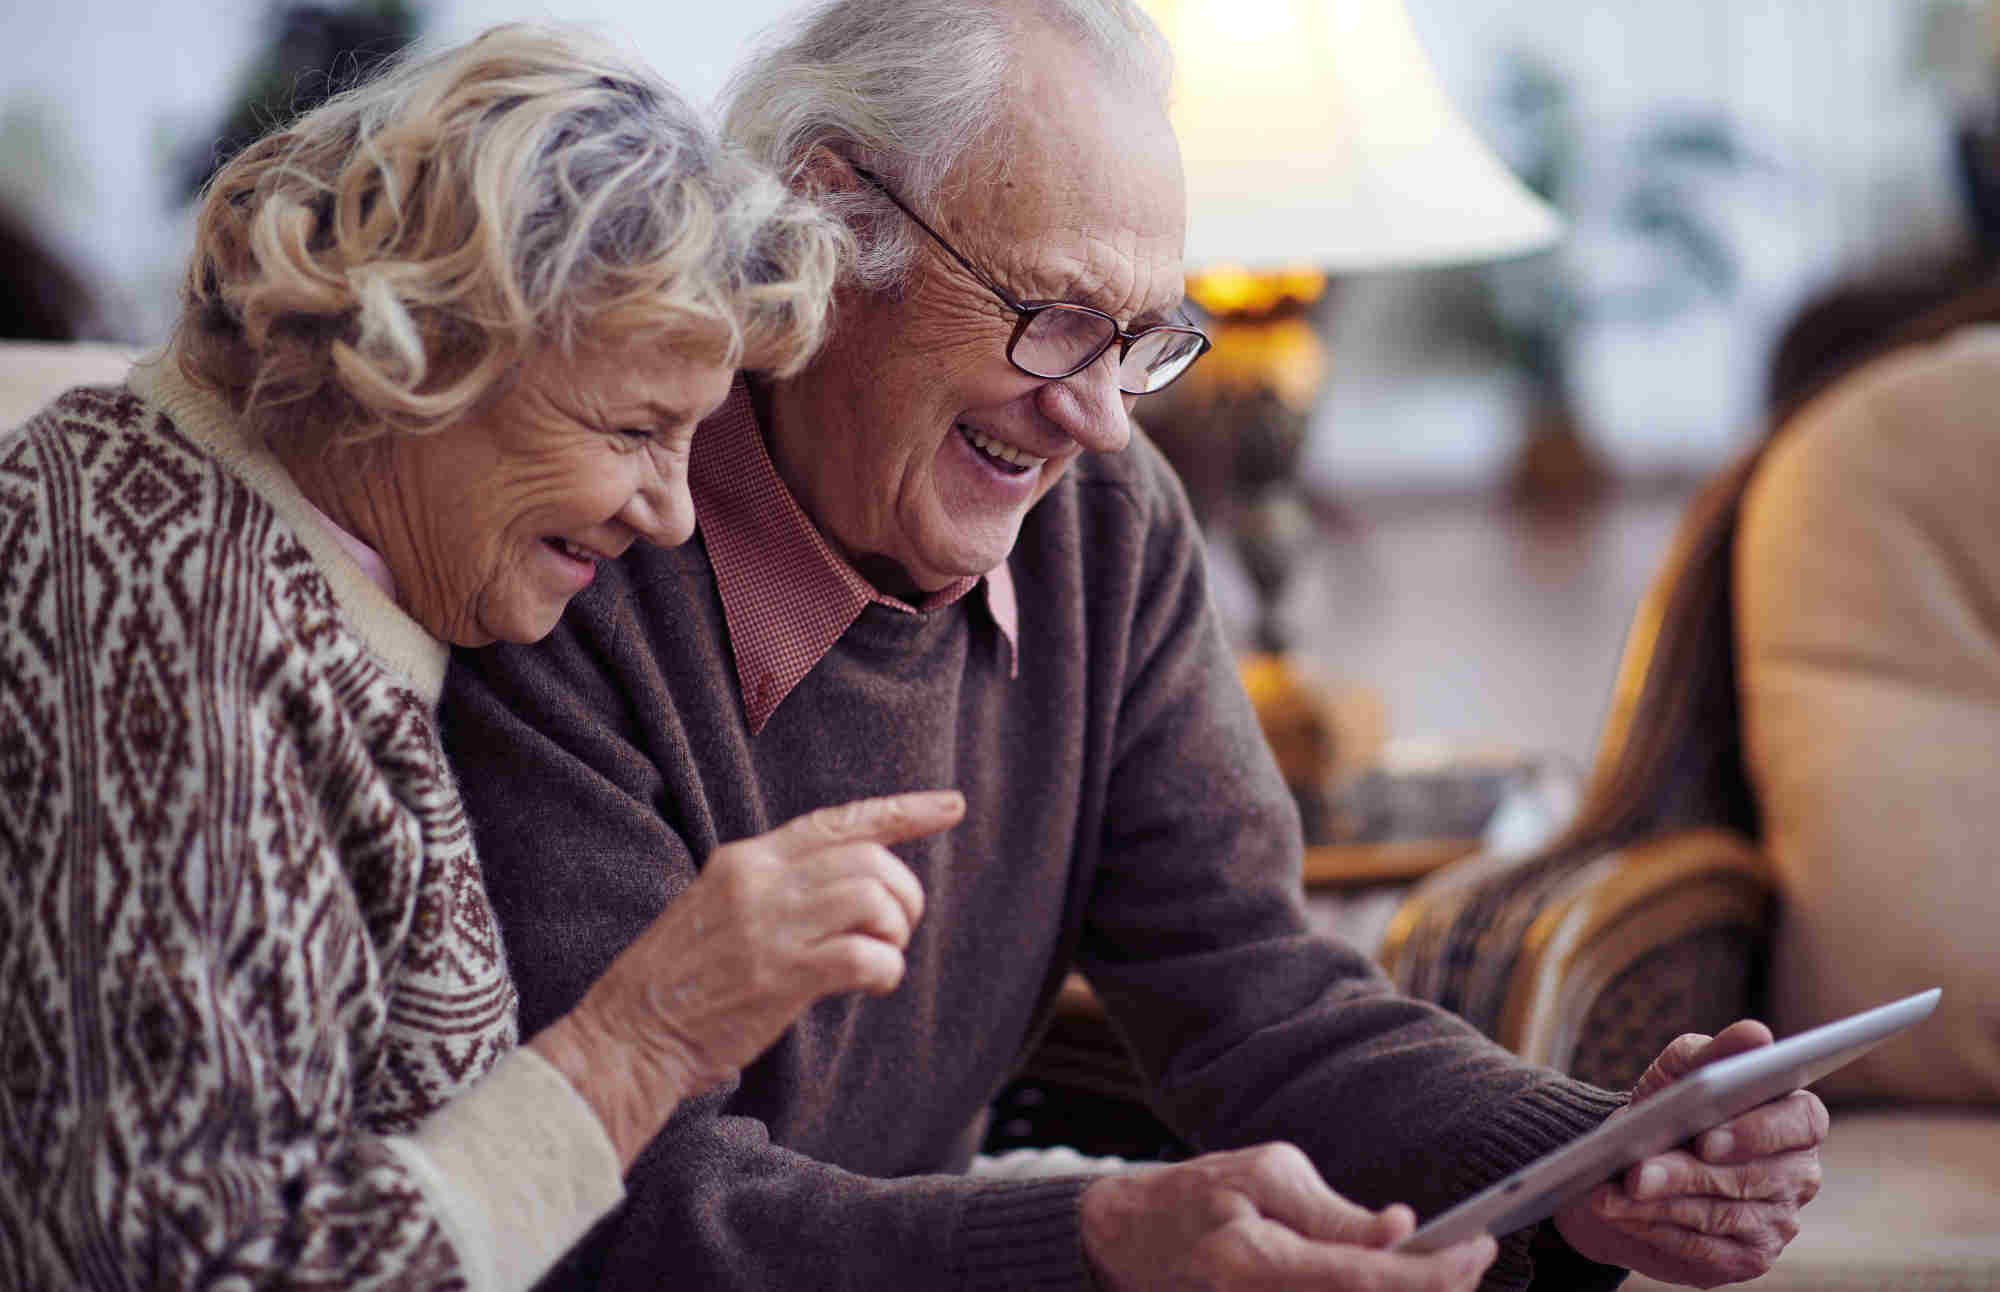 grandparents smiling at tablet